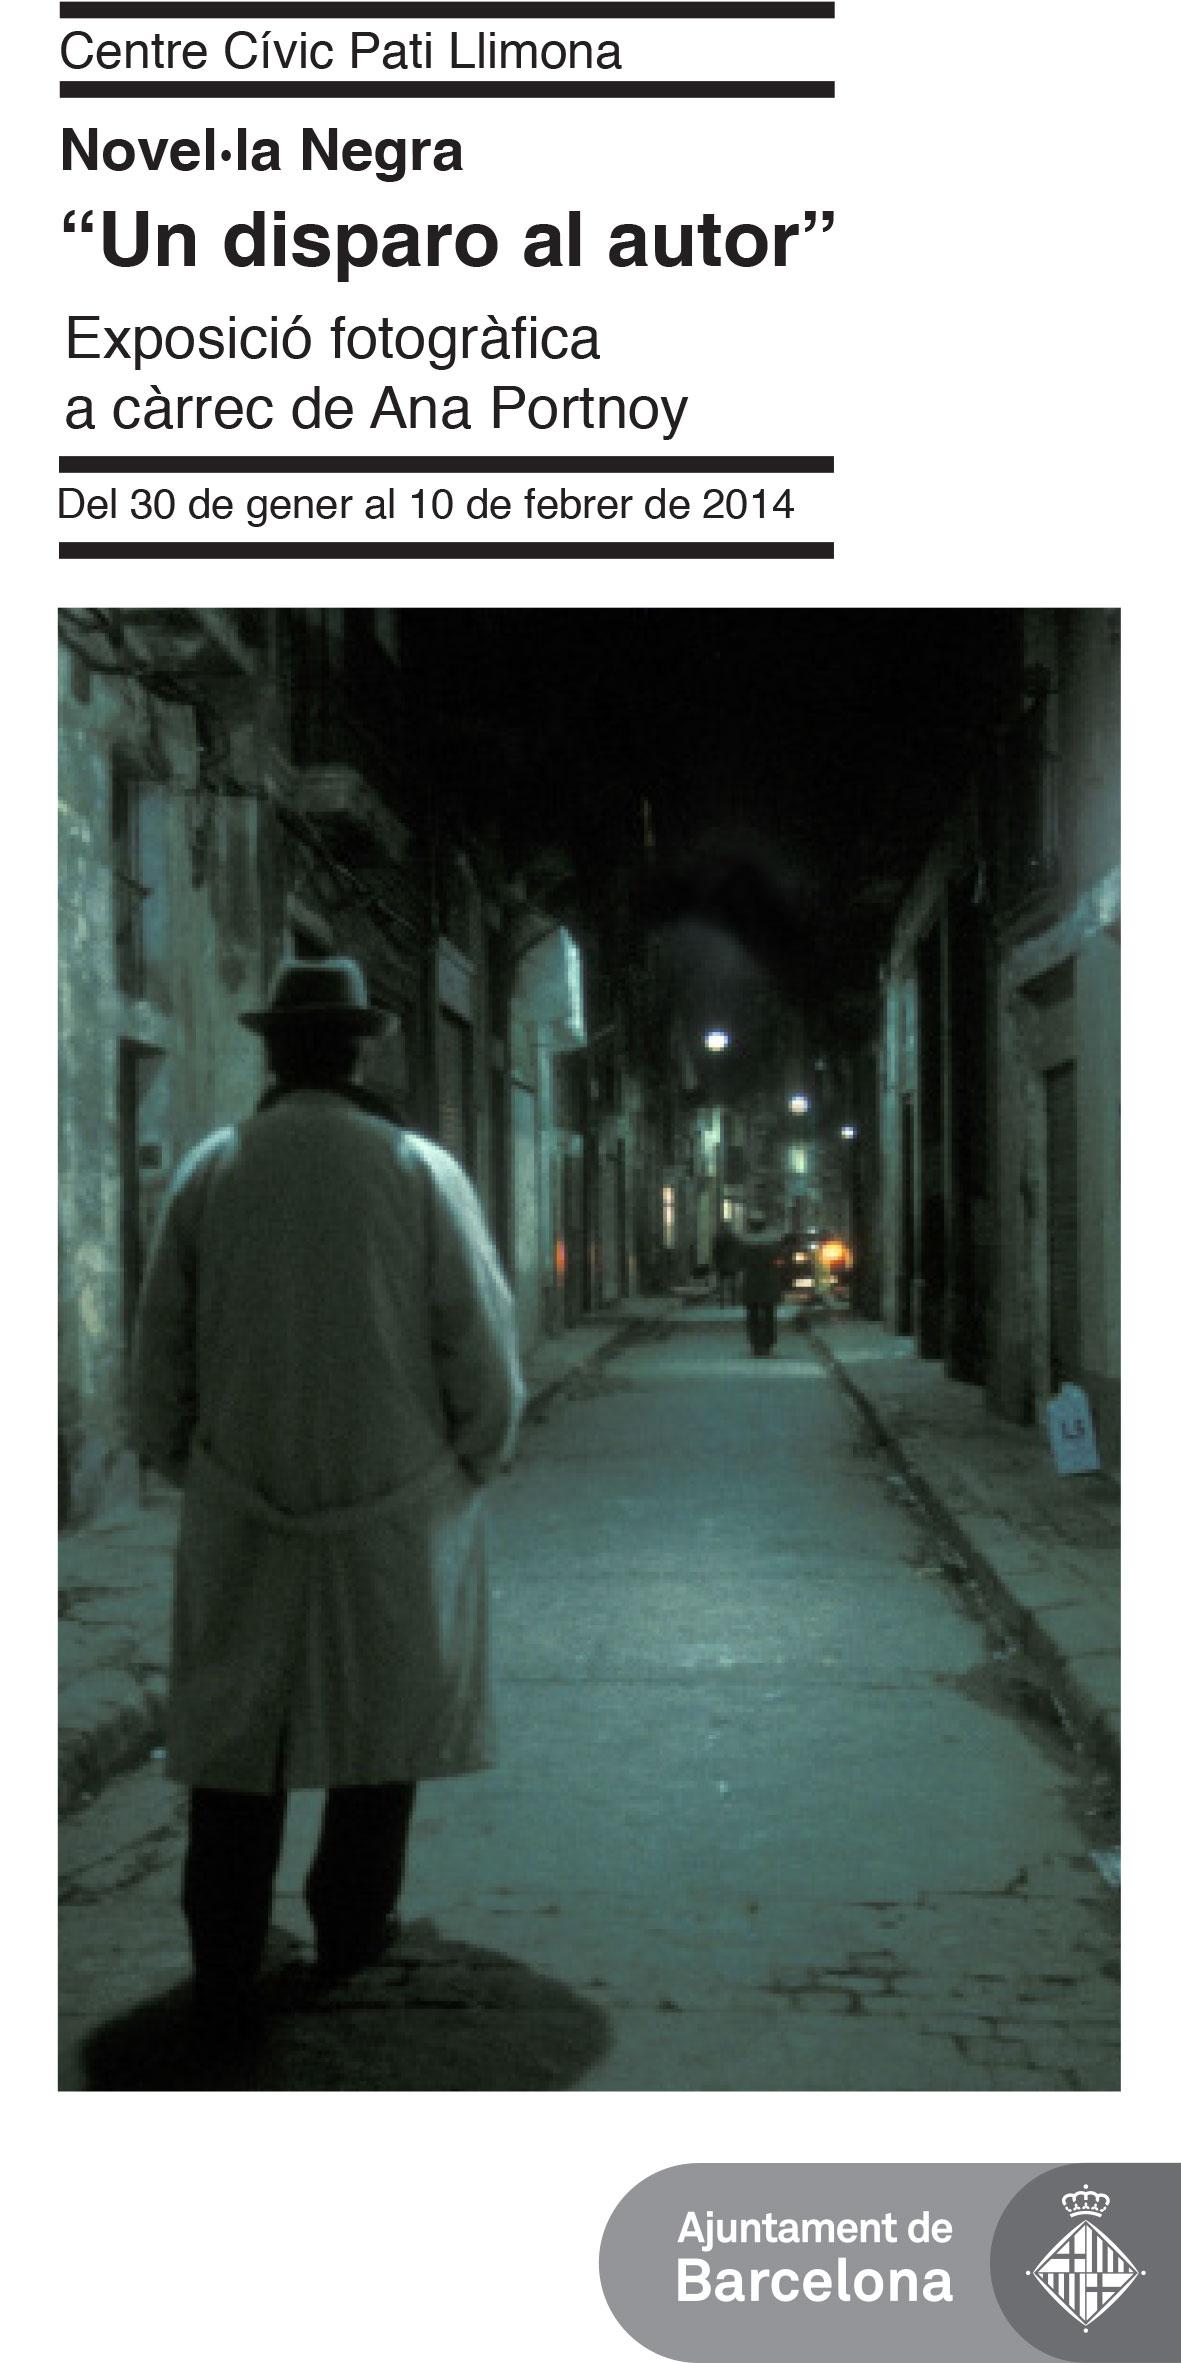 "Novela Negra: ""Un disparo al autor"" de Ana Portnoy"